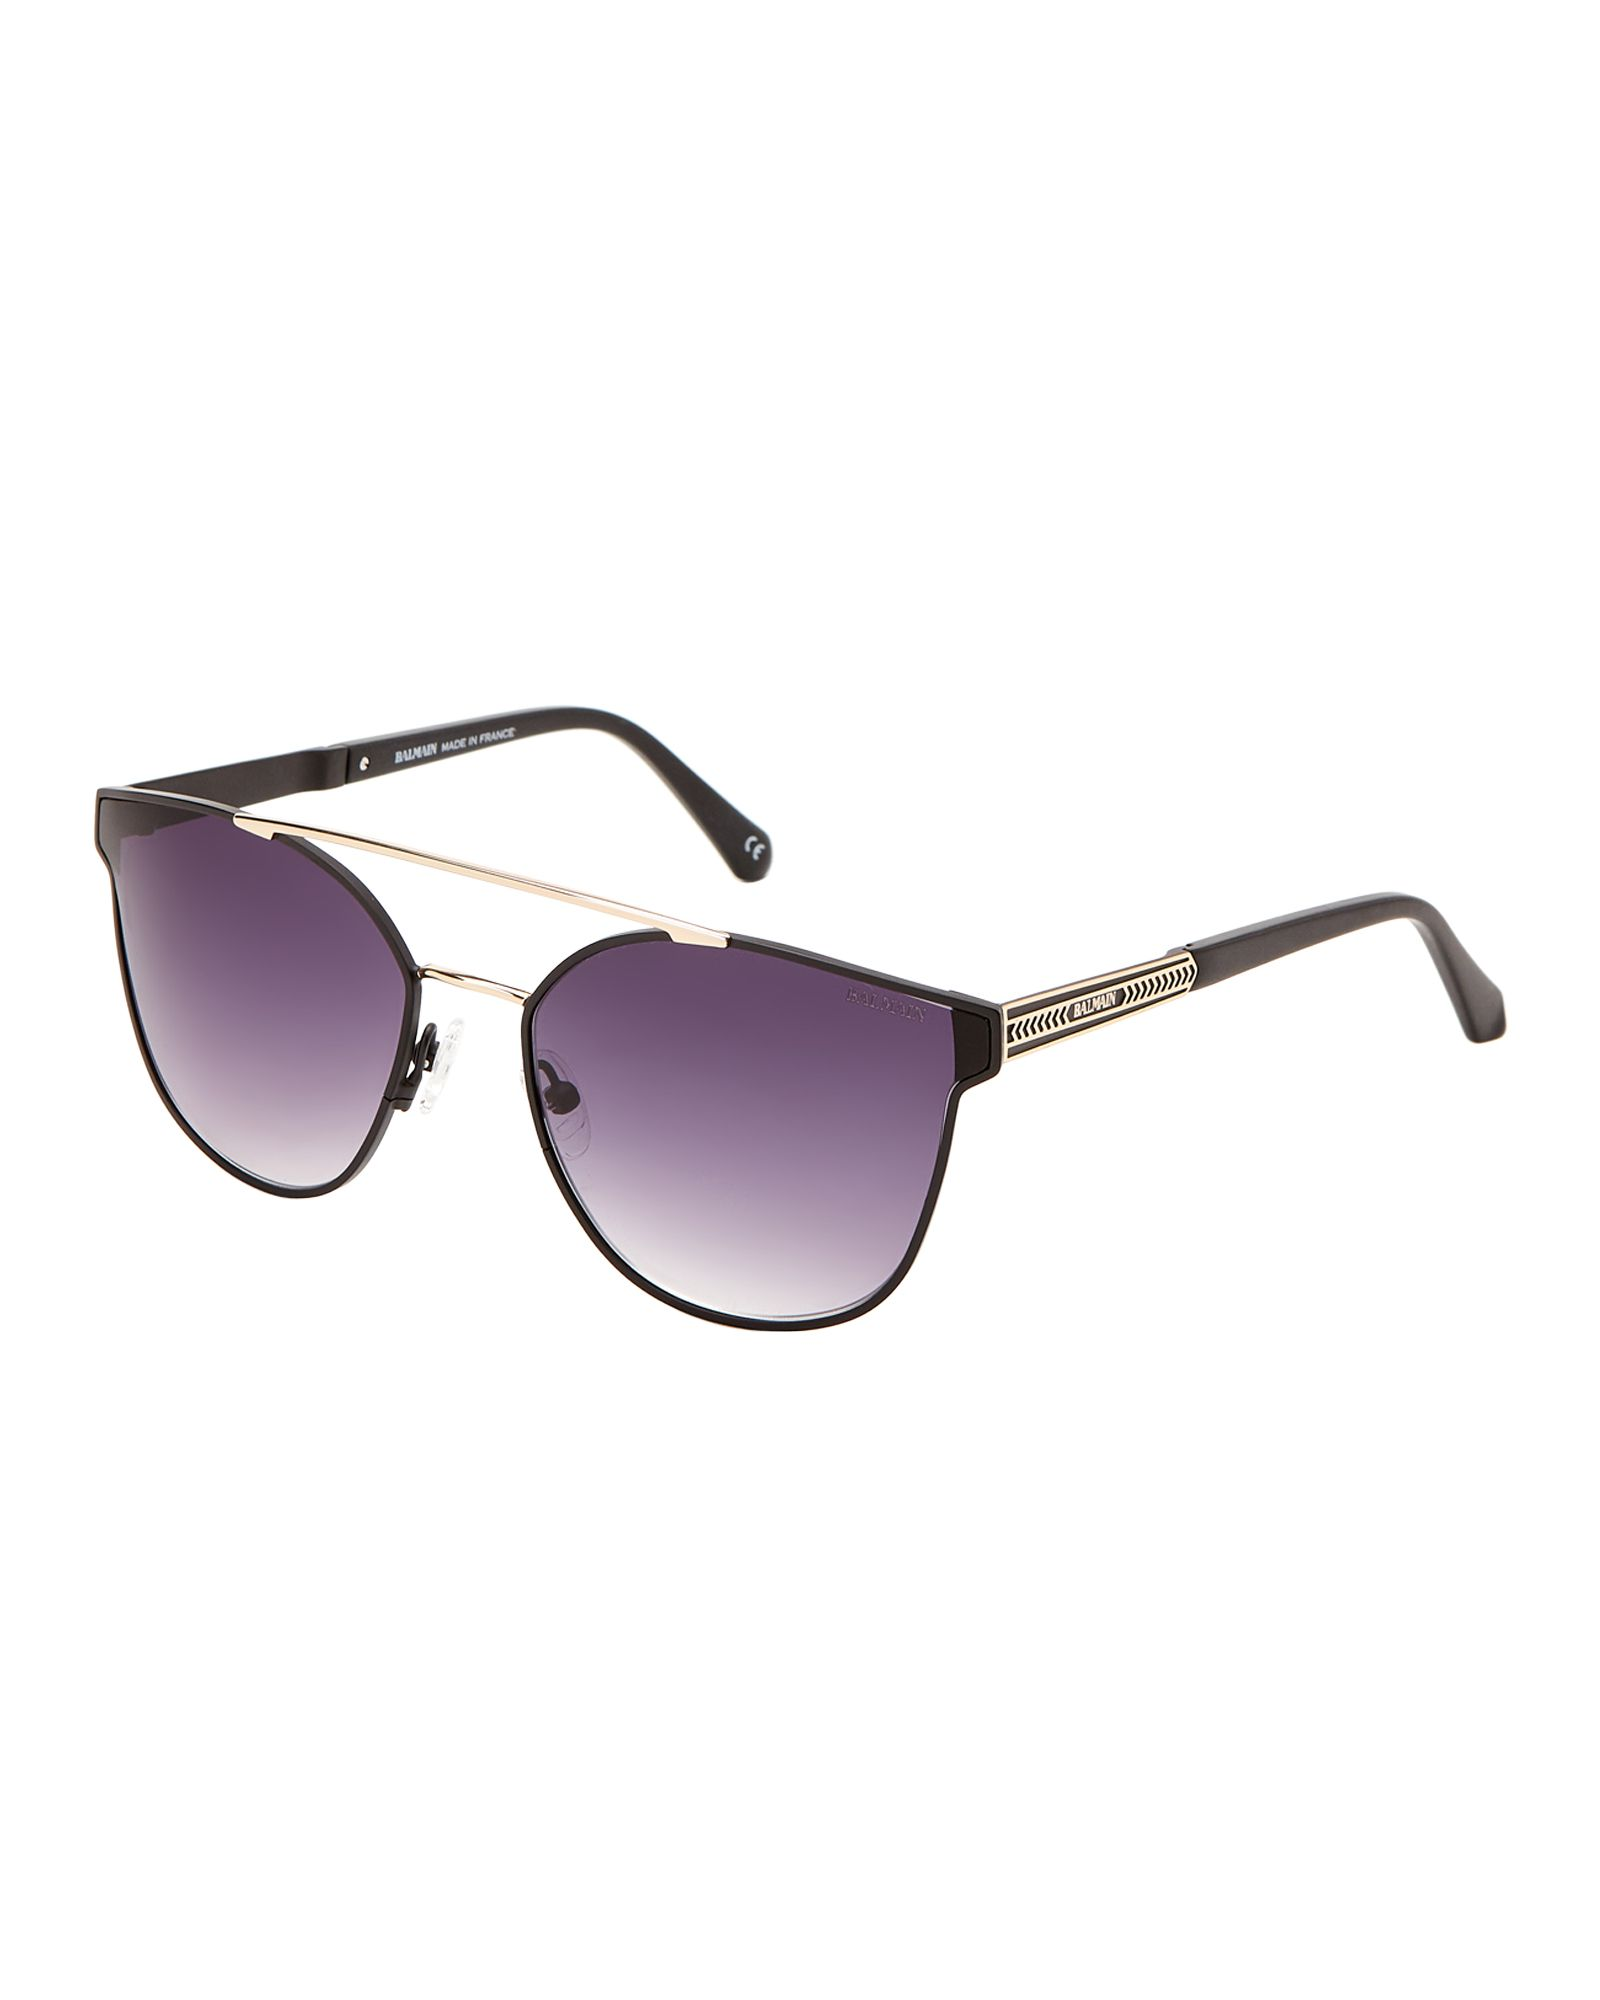 4b5b79f6697b Balmain BL252204 Matte Black & Gold-Tone Wayfarer Sunglasses ...